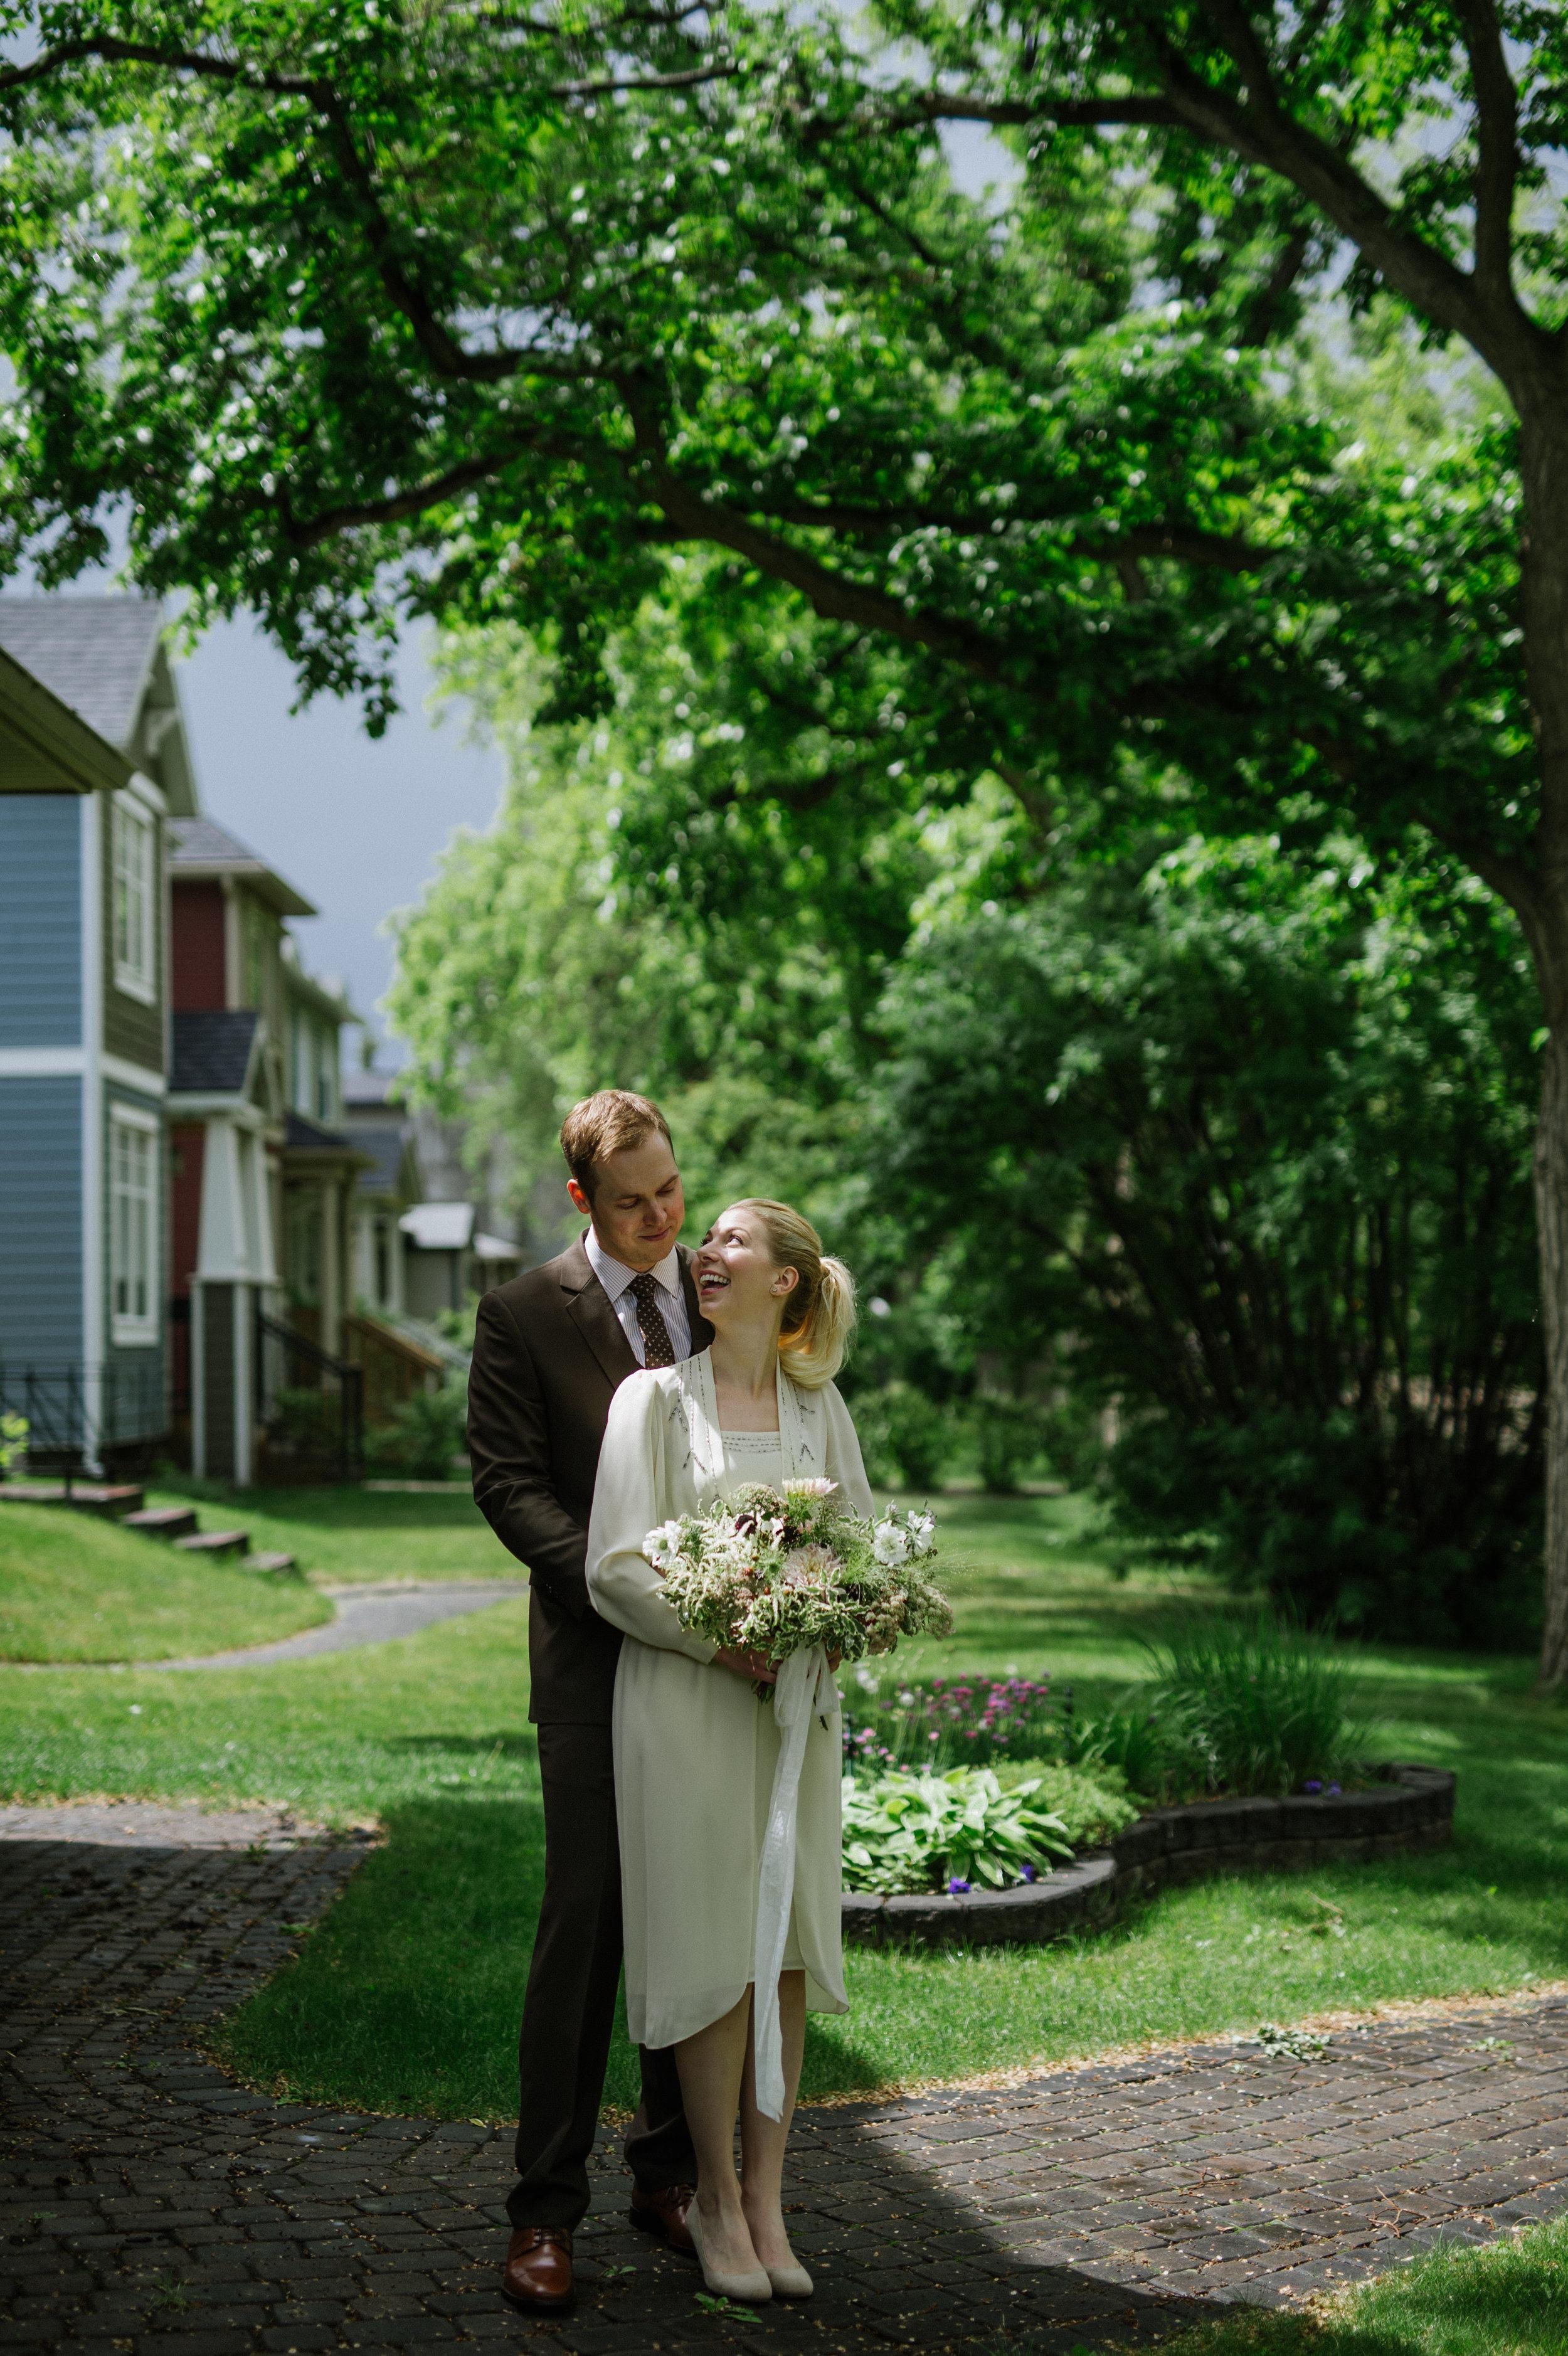 Teatro_Wedding_Calgary_Wedding_Photography_Vanessa_Tom_Married_2018_HR192.jpg